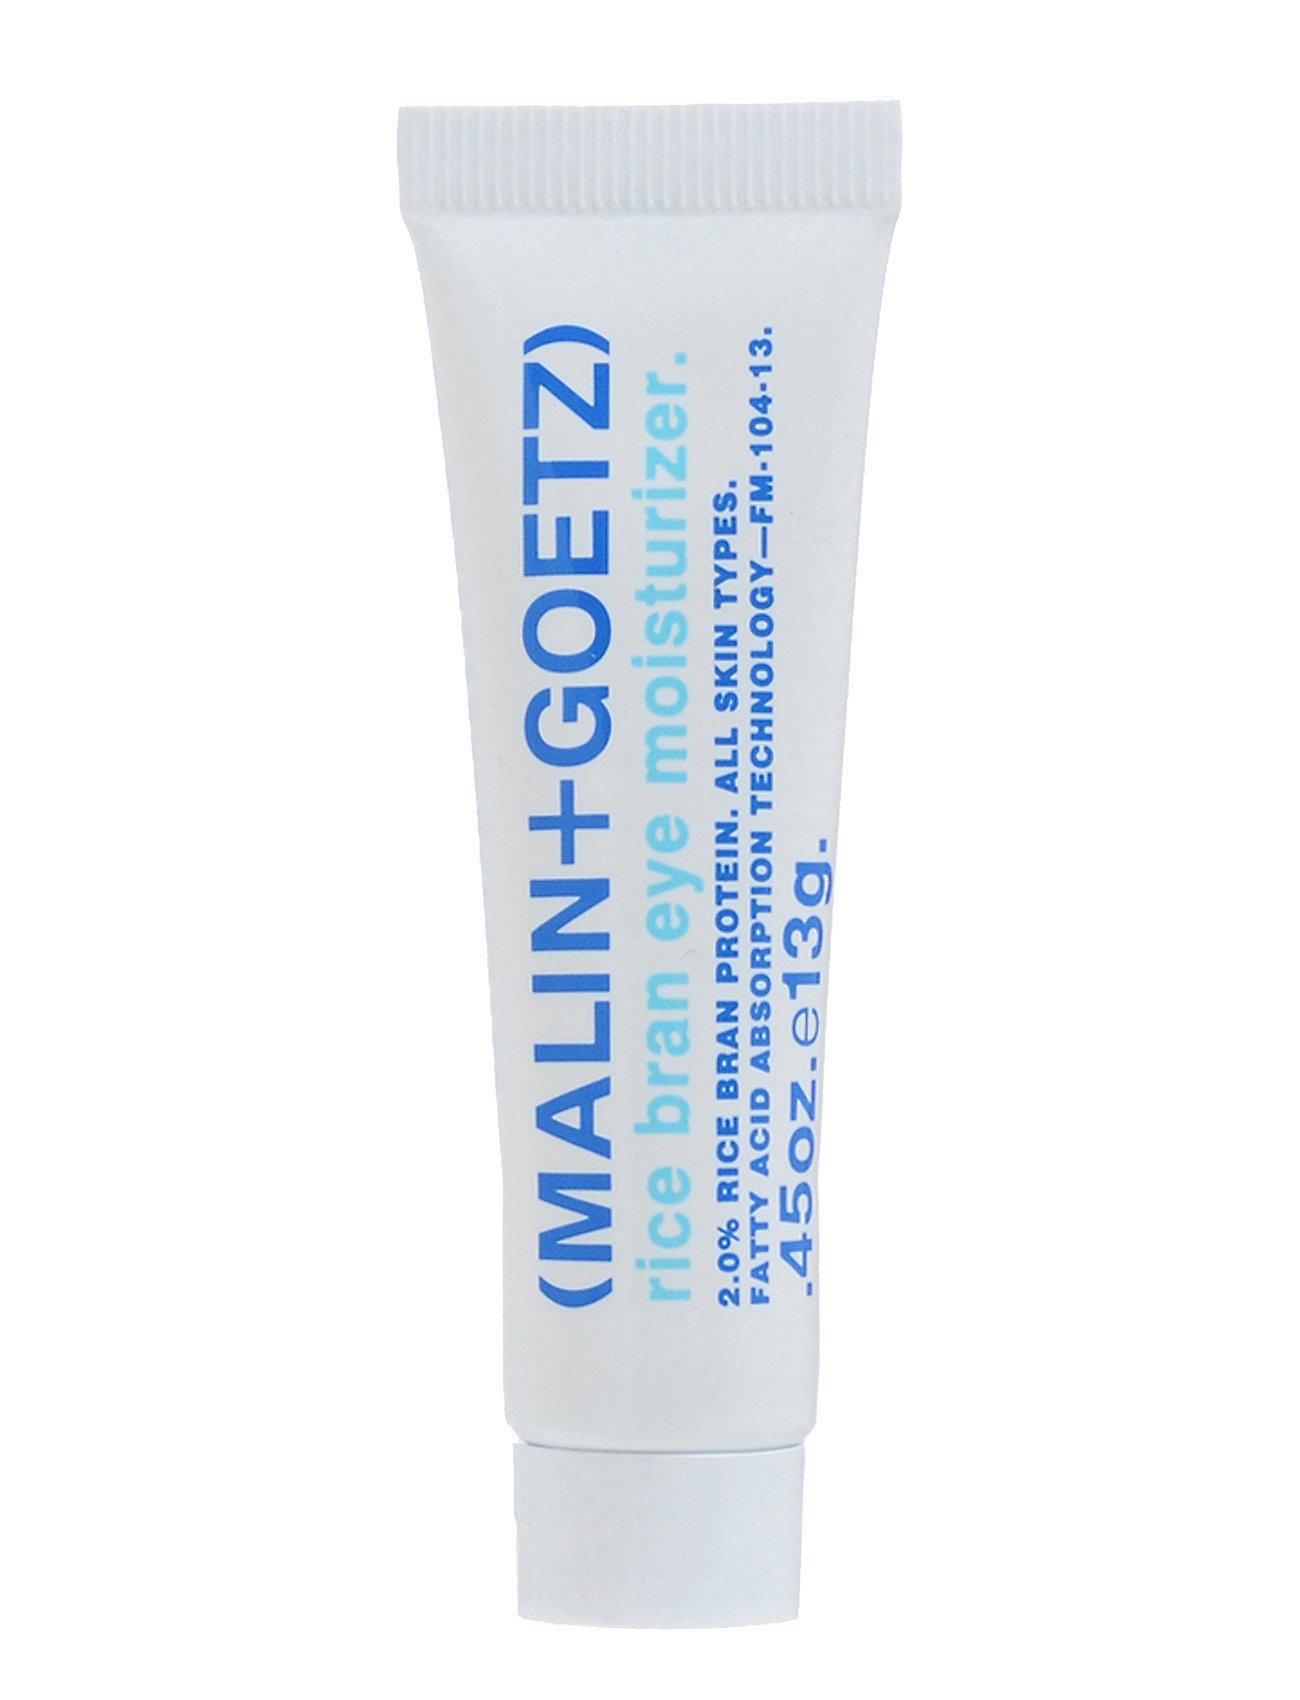 malin+goetz Rice bran eye moisturizer på boozt.com dk